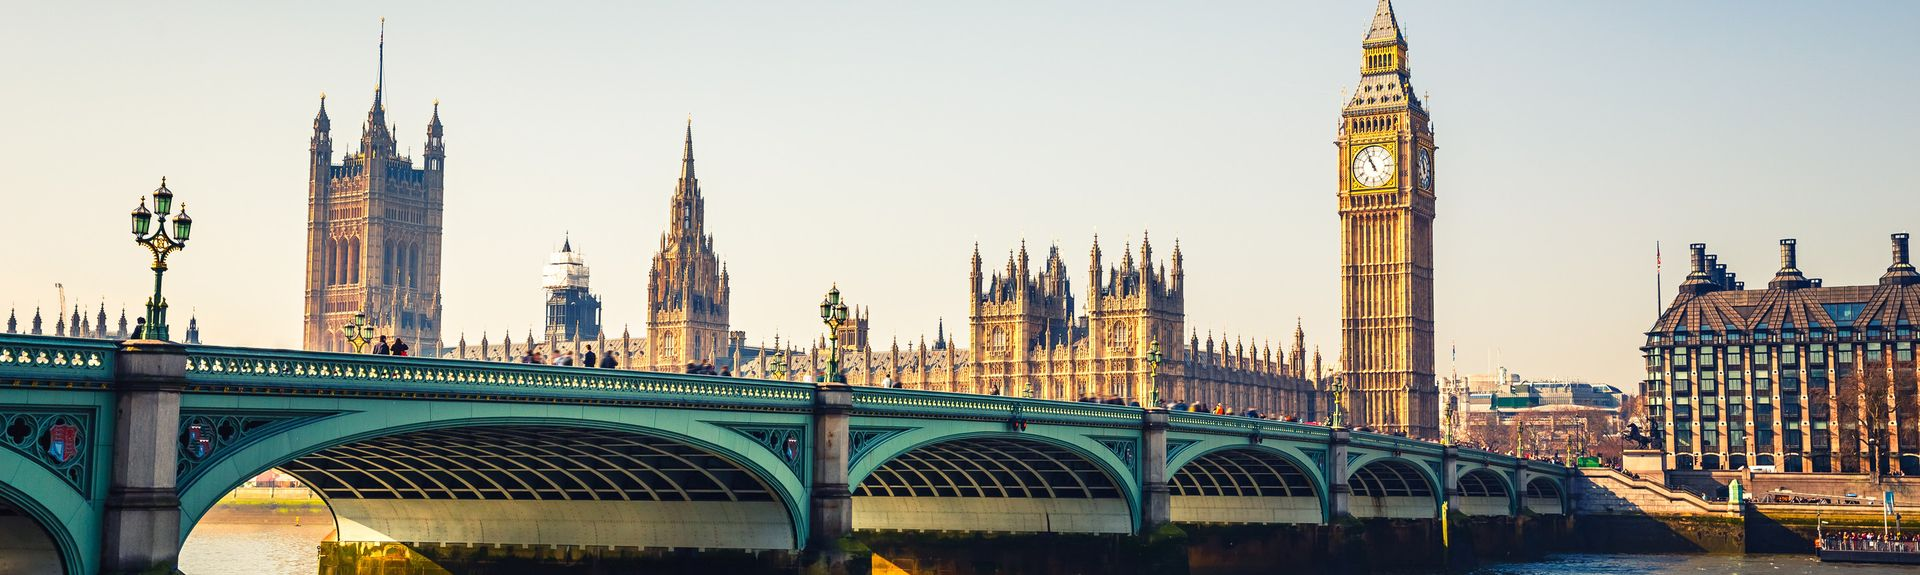 Central London, London, England, United Kingdom